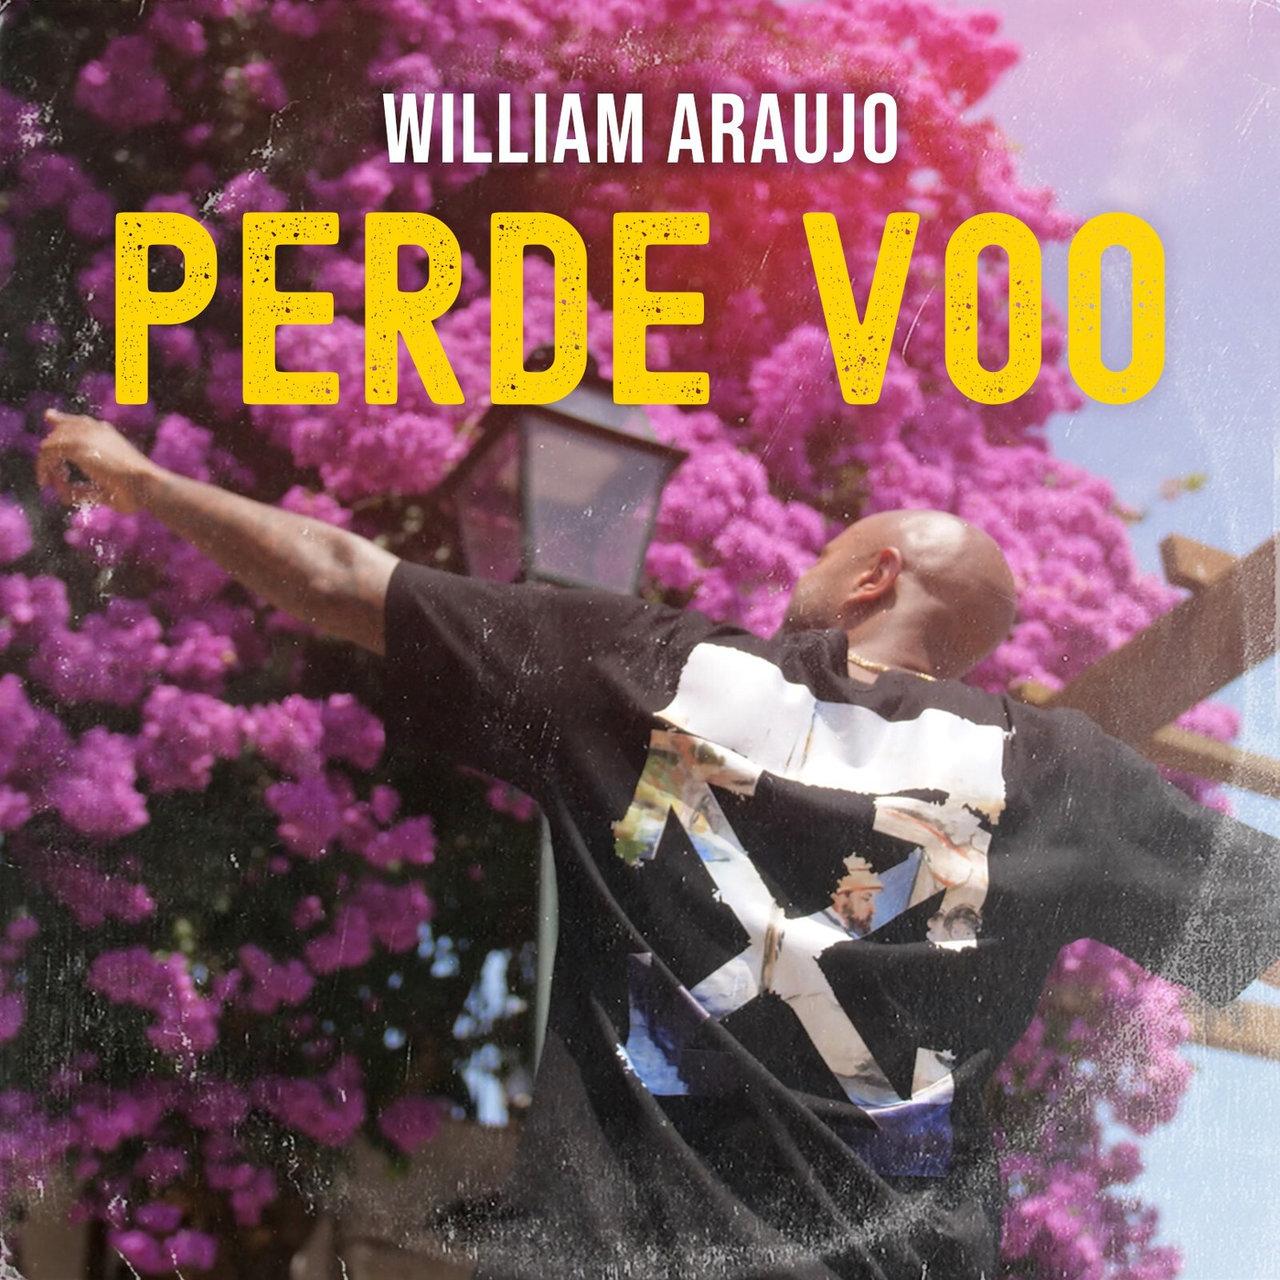 William Araujo - Perde Voo (Cover)